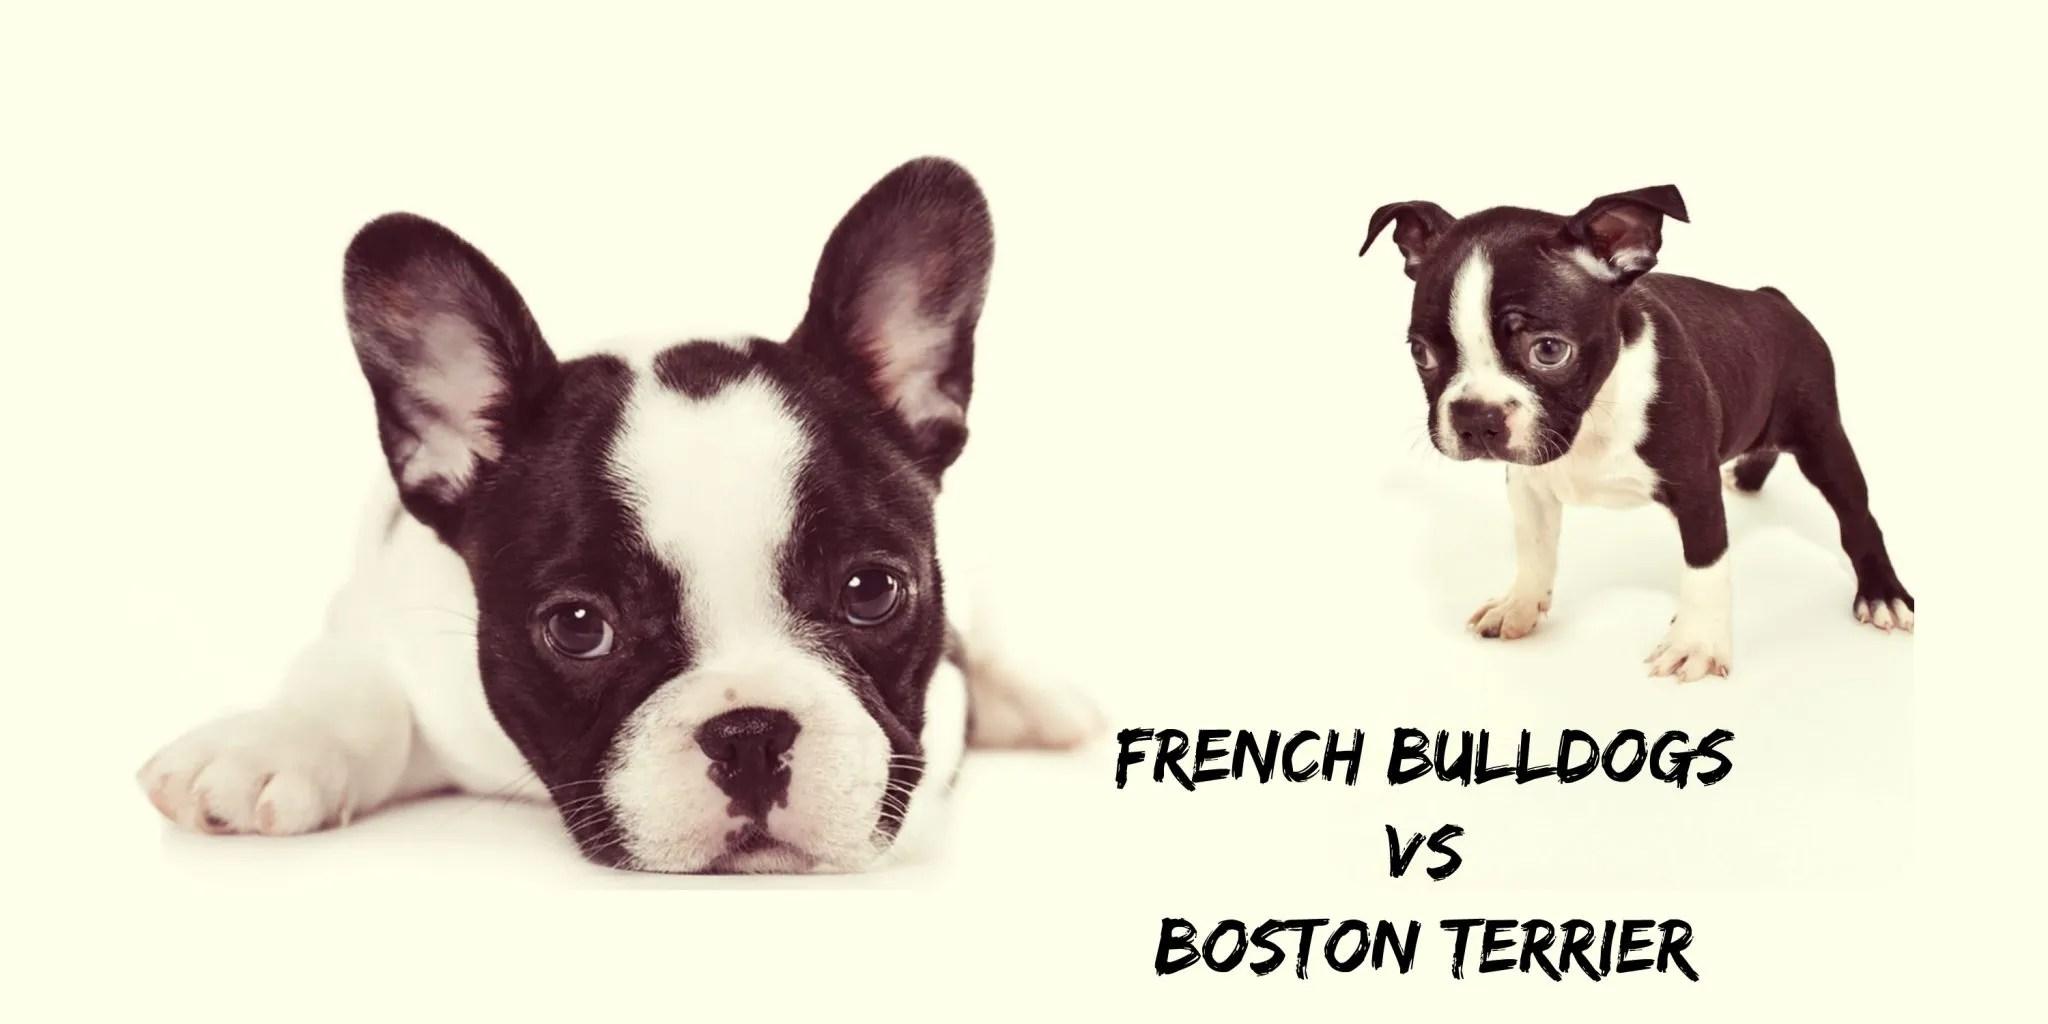 Breathtaking French Bulldog Vs Boston Terrier Why Do French Bulldogs Shed So Much Do French Bulldogs Shed Much bark post Do French Bulldogs Shed